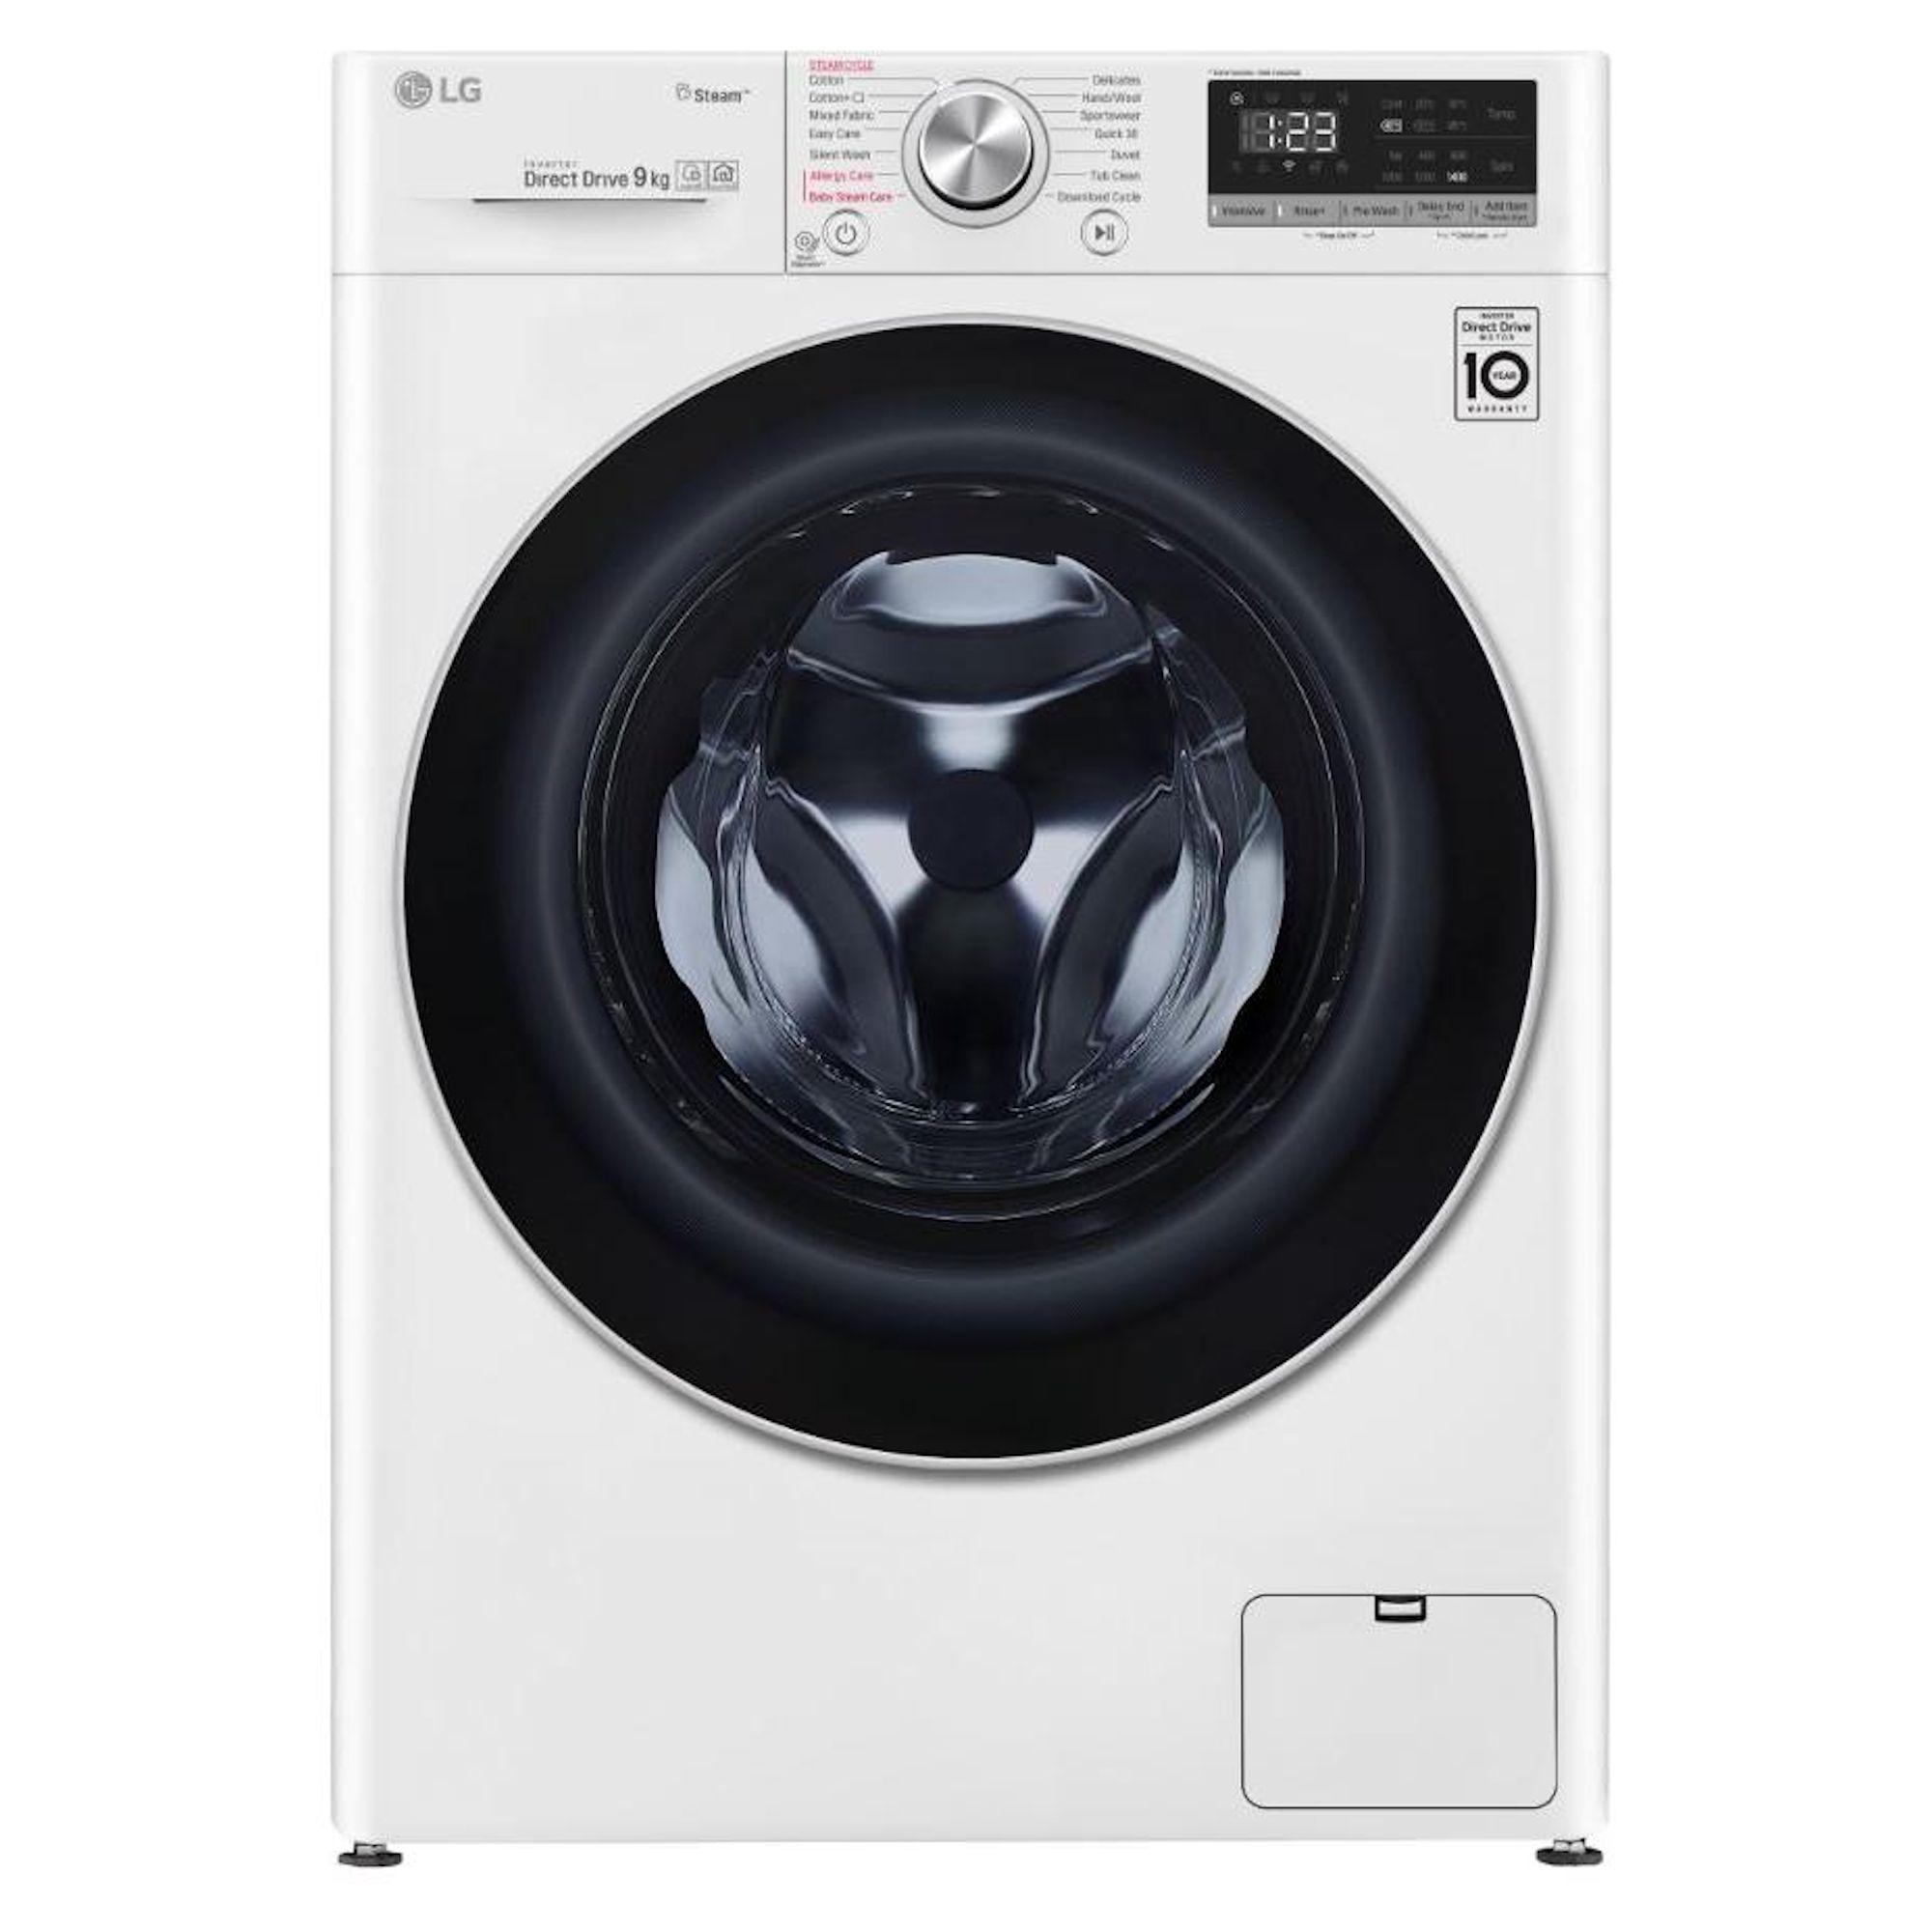 LG F4V509WS 9KG 1400 Washing Machine Latest 2019 model 5 year warranty £379 at Hughes